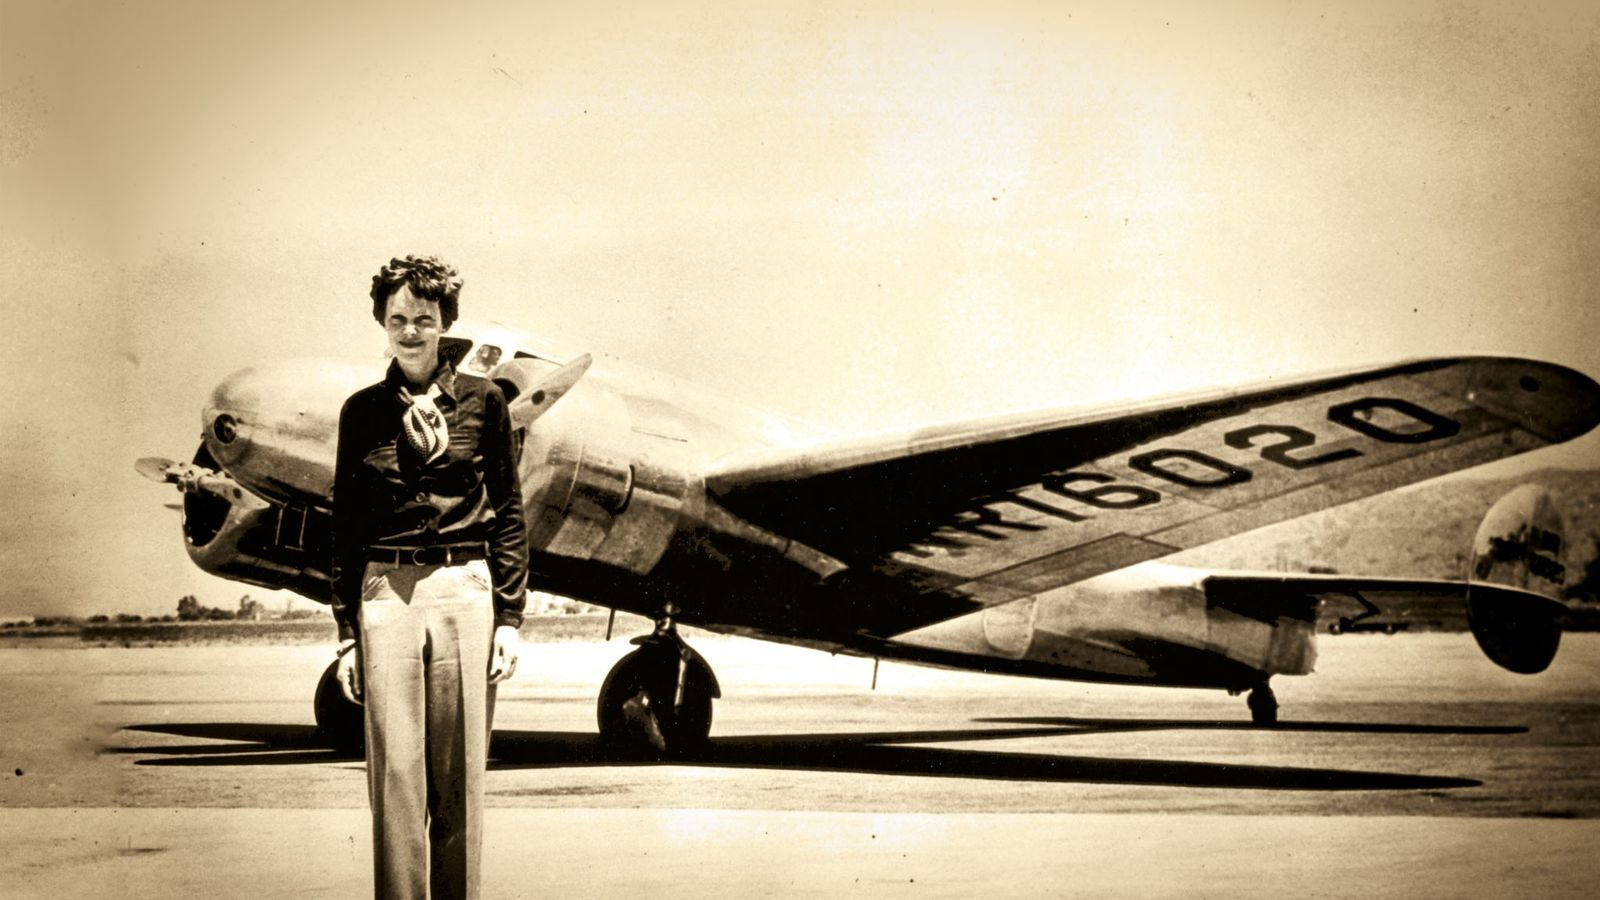 Amelia Earhart prend la pose devant son avion, le Lockheed Electra, à bord duquel elle a ...